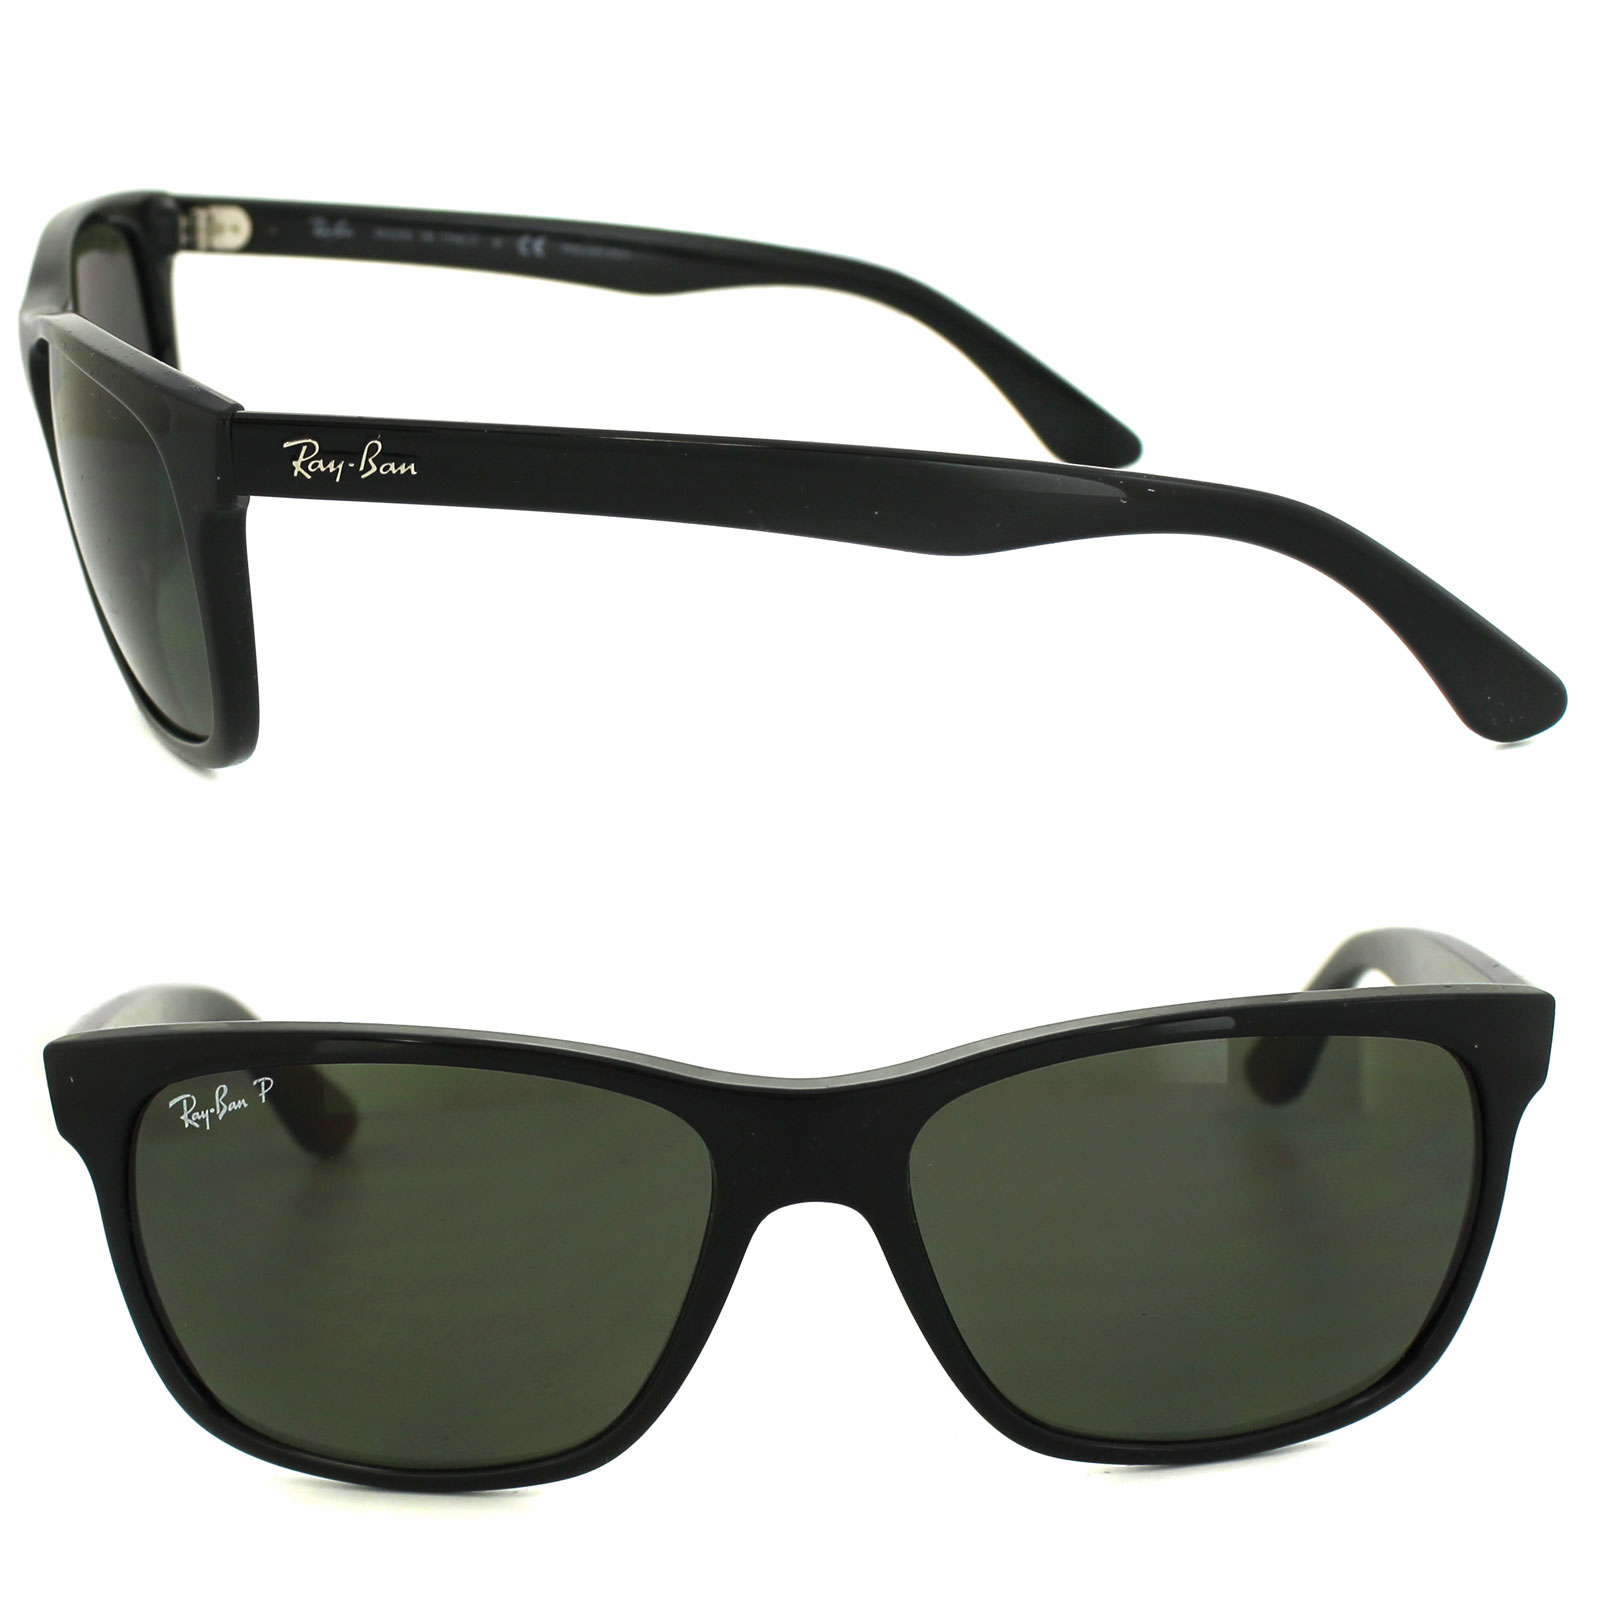 dc36625cc2 RayBan Sunglasses 4181 601 9A Black Polarized Green 713132452646